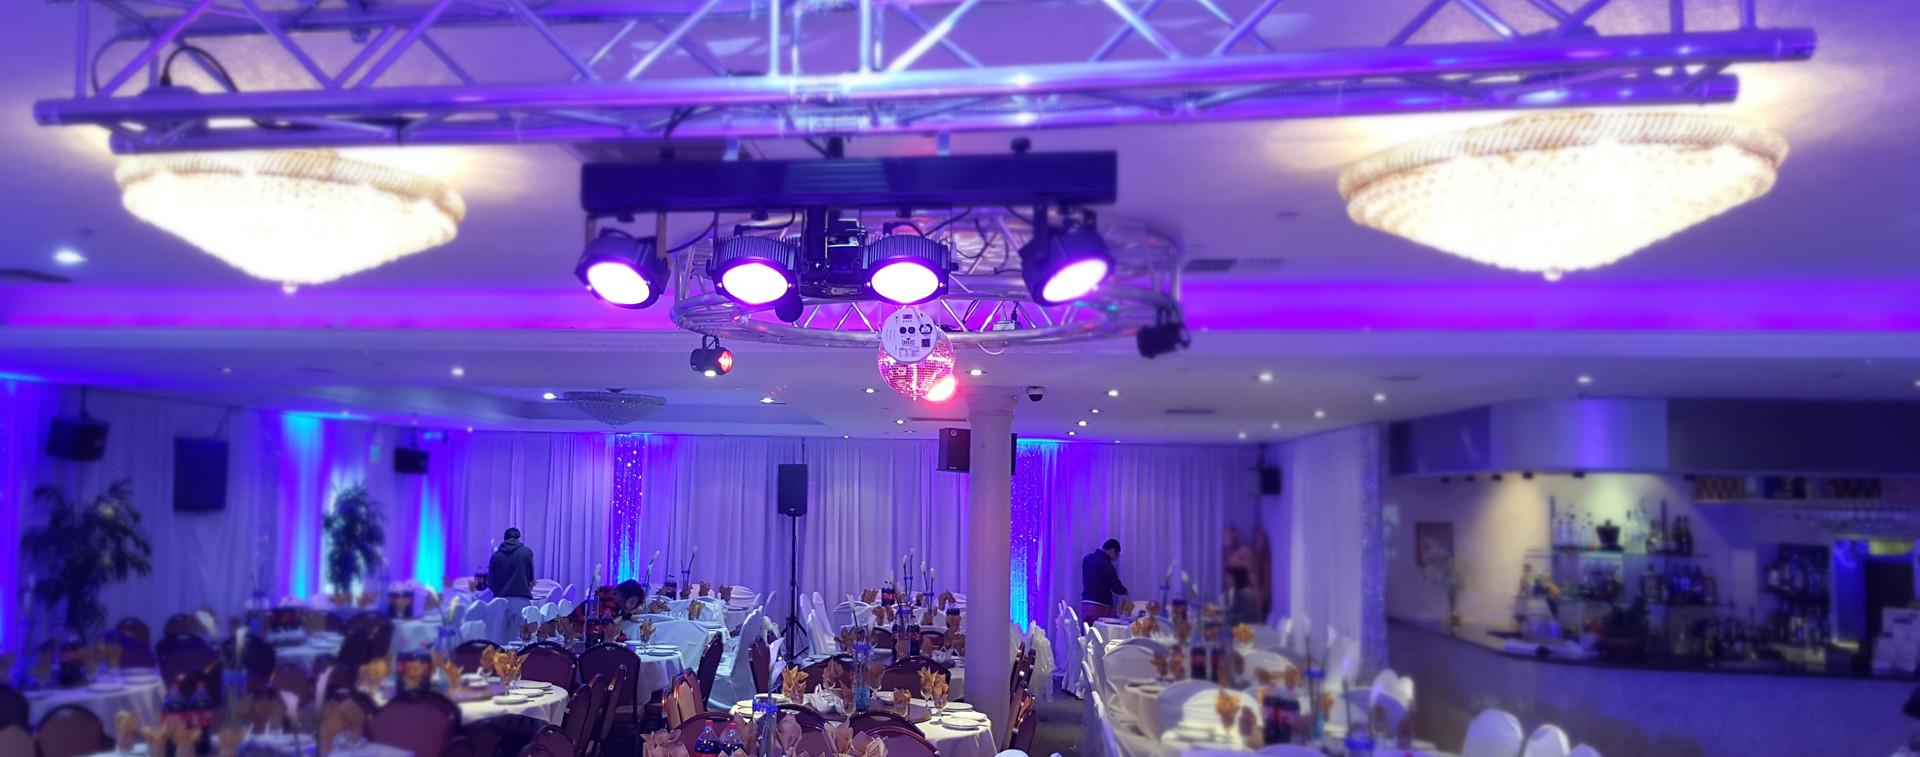 Banquet Gallery